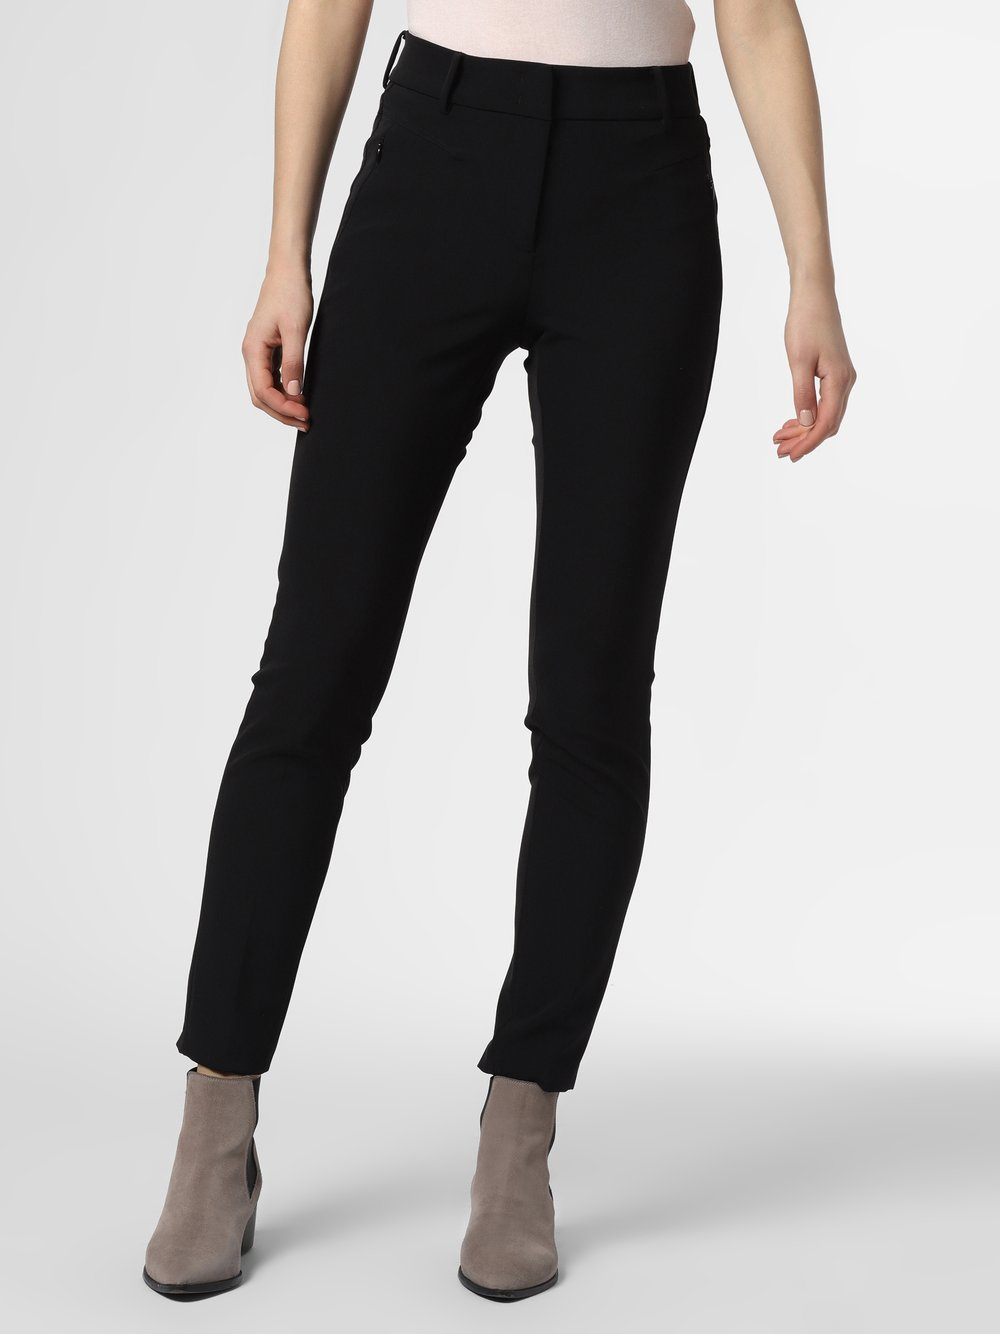 Cambio - Spodnie damskie – Sybille, czarny